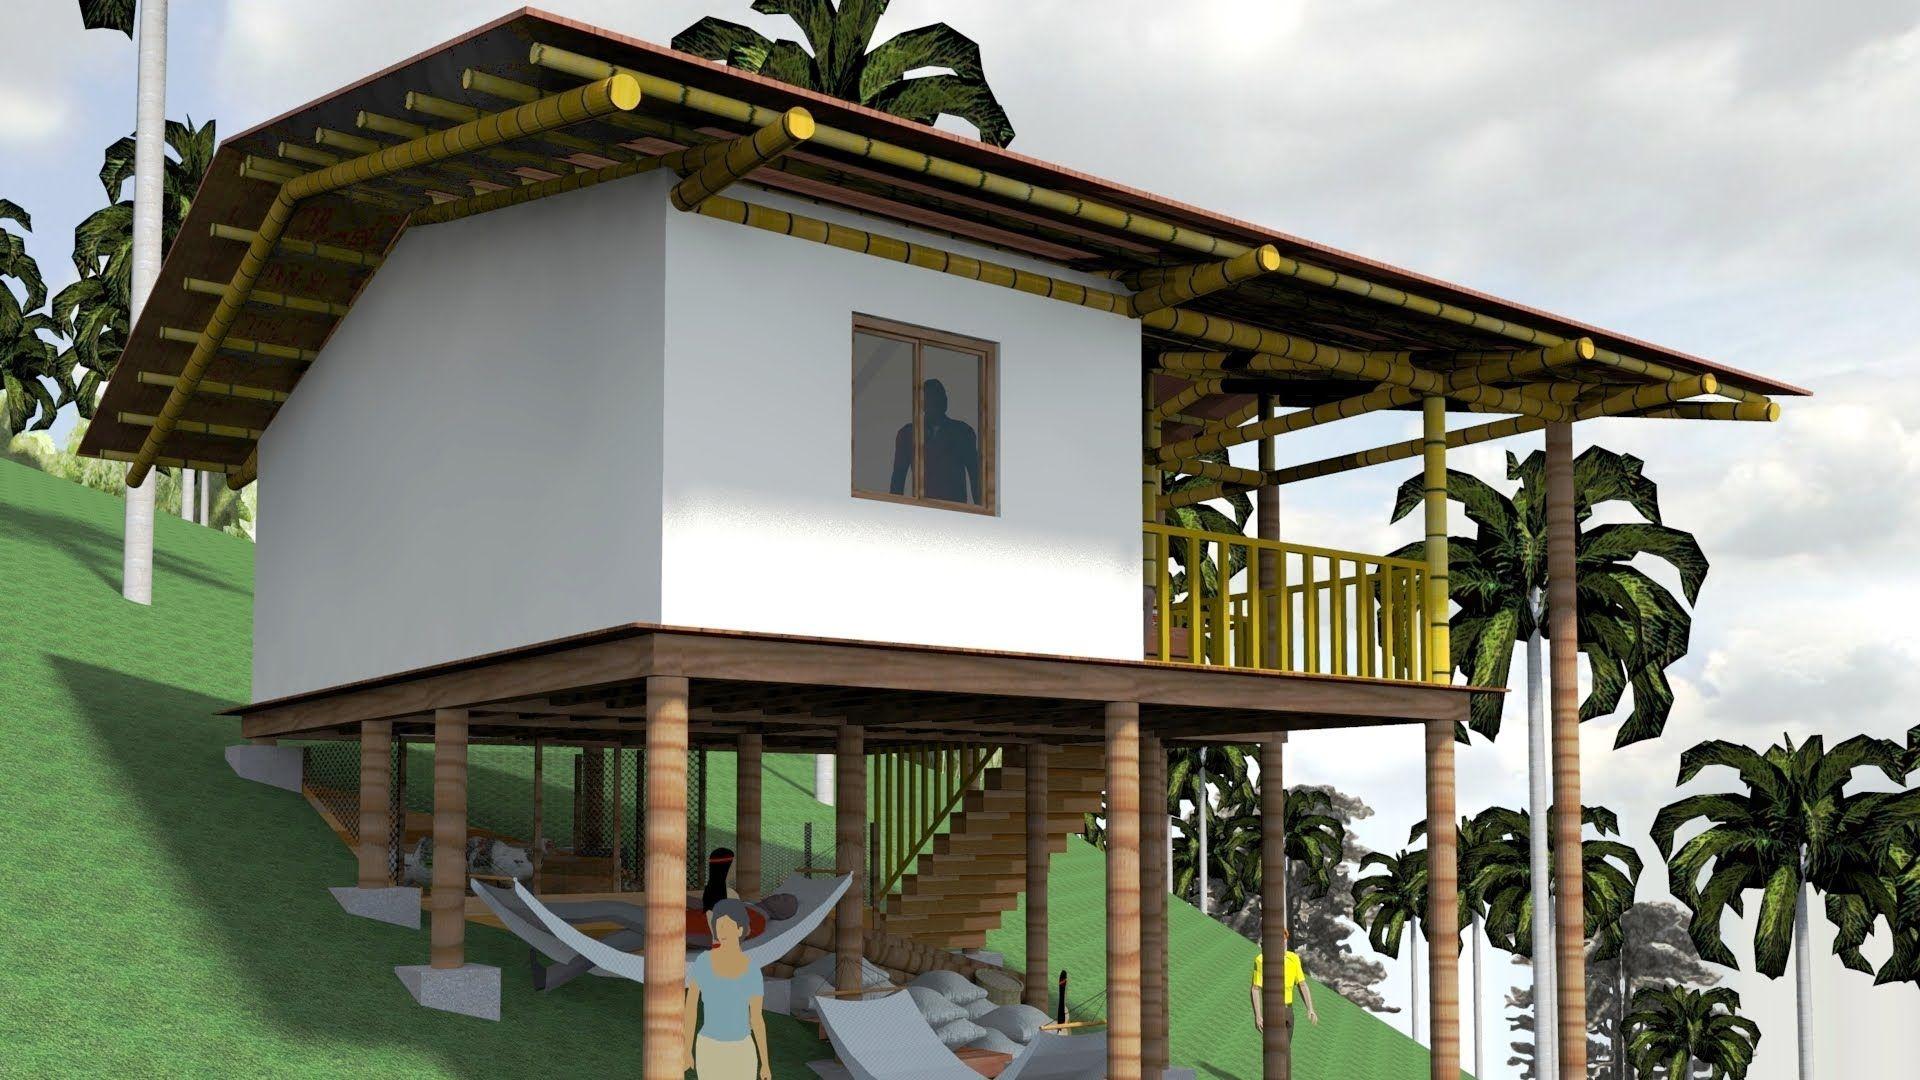 Casa ind gena palafitica en madera y bamb guadua - Youtube casas de madera ...